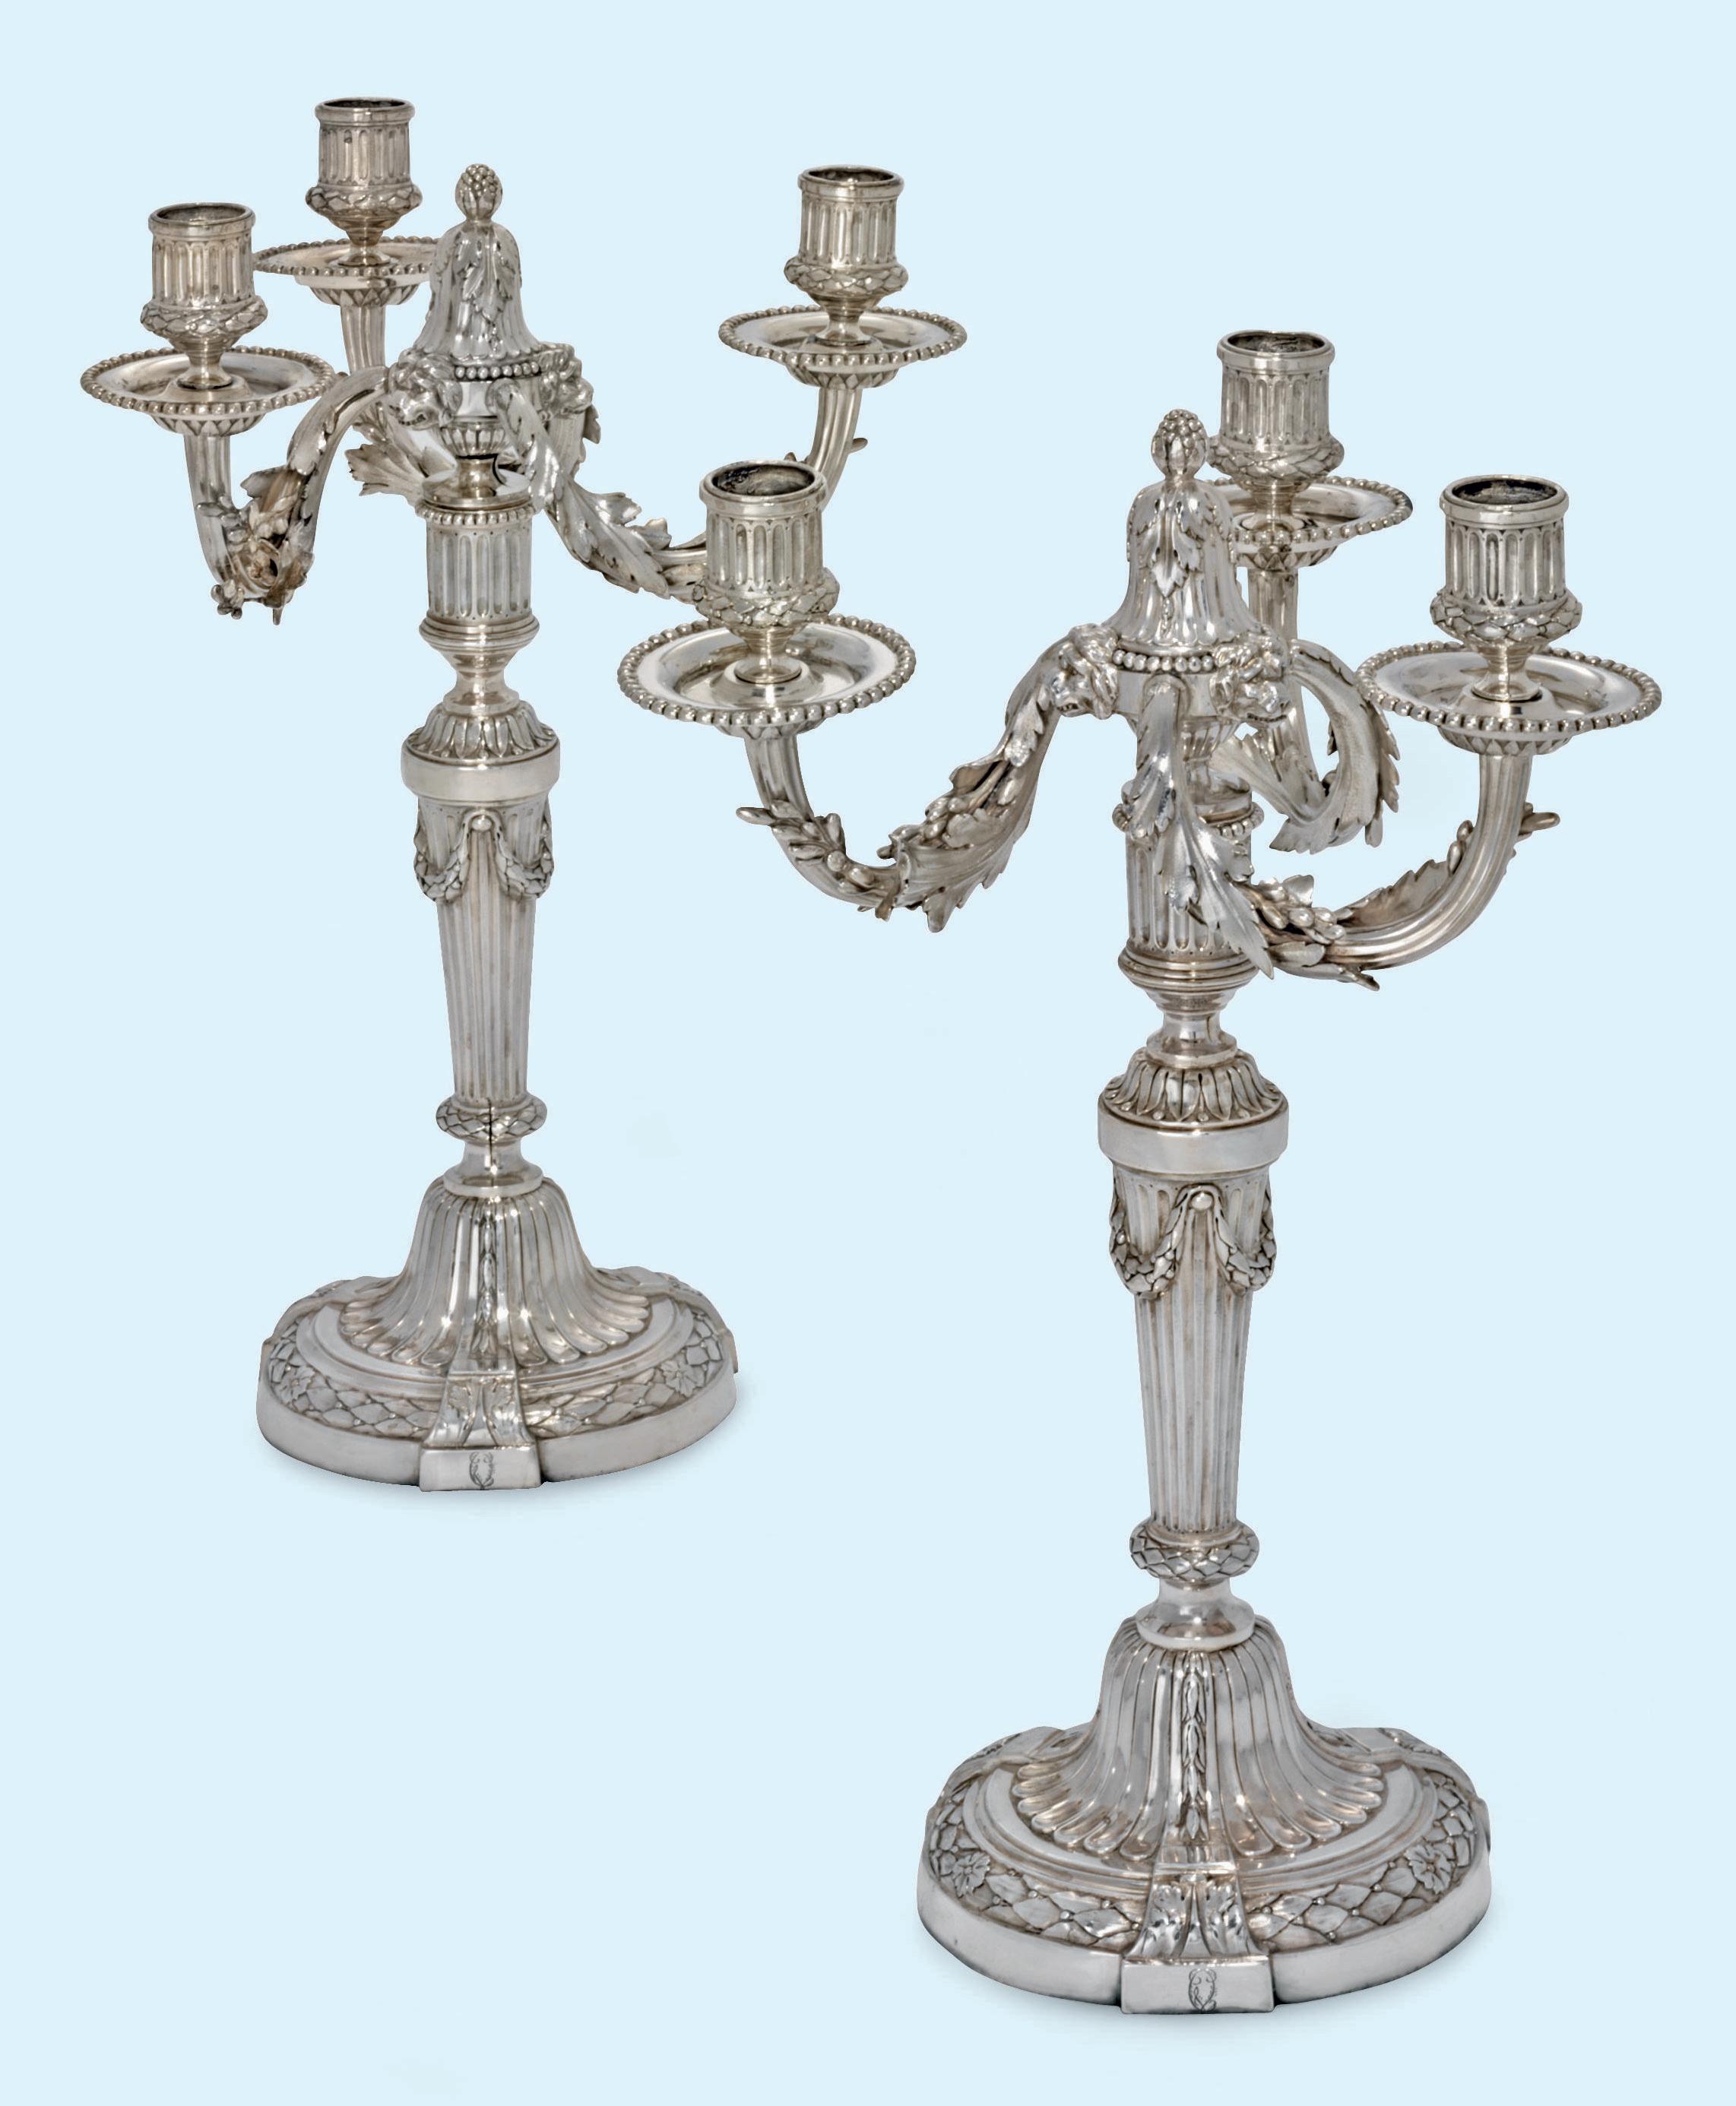 A PAIR OF LOUIS XVI SILVER THREE-LIGHT CANDELABRA